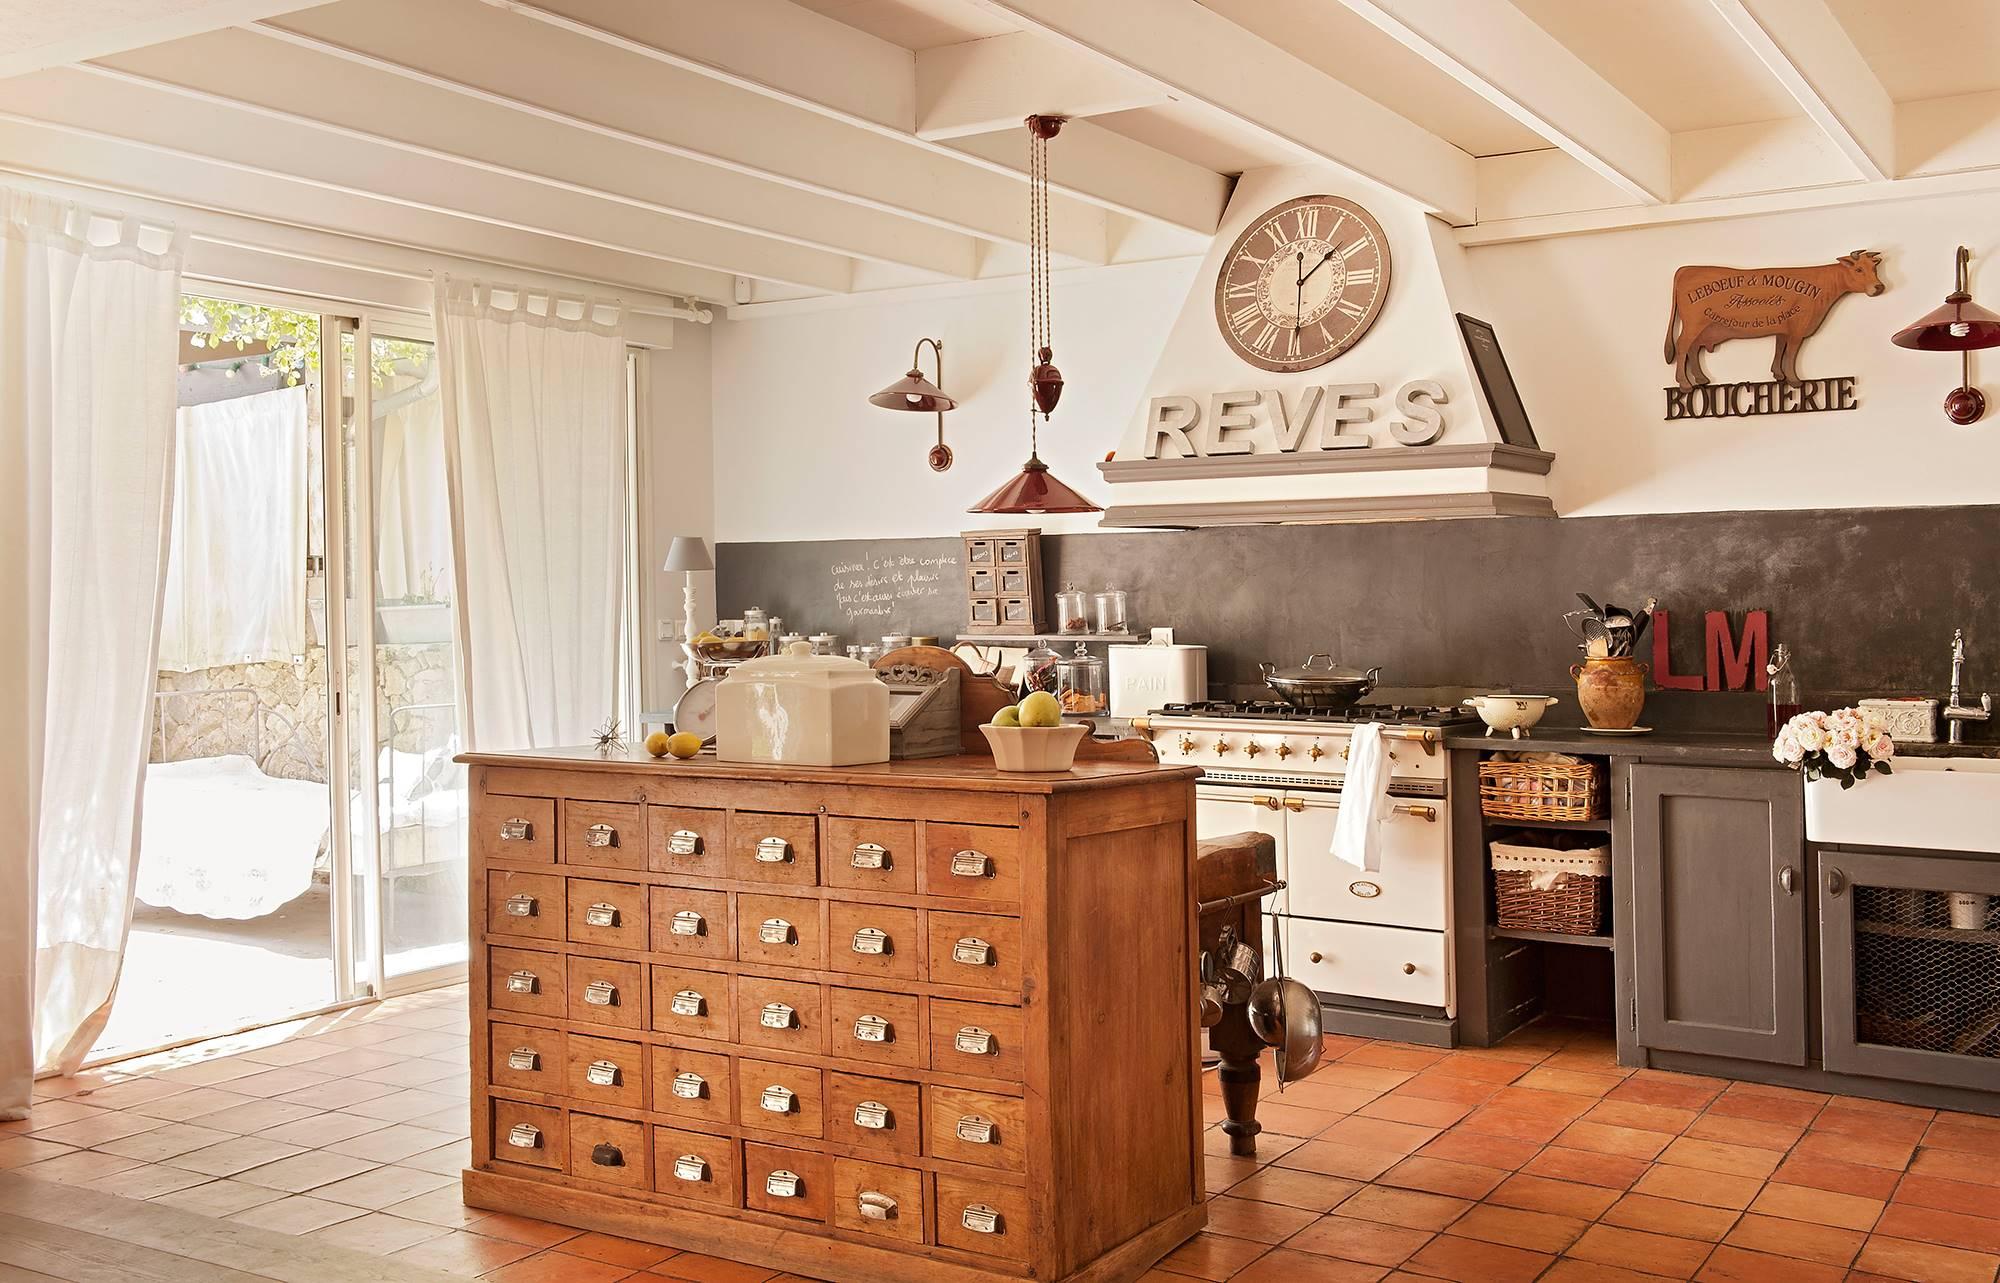 130 fotos de cajoneras - Cajoneras de cocina ...